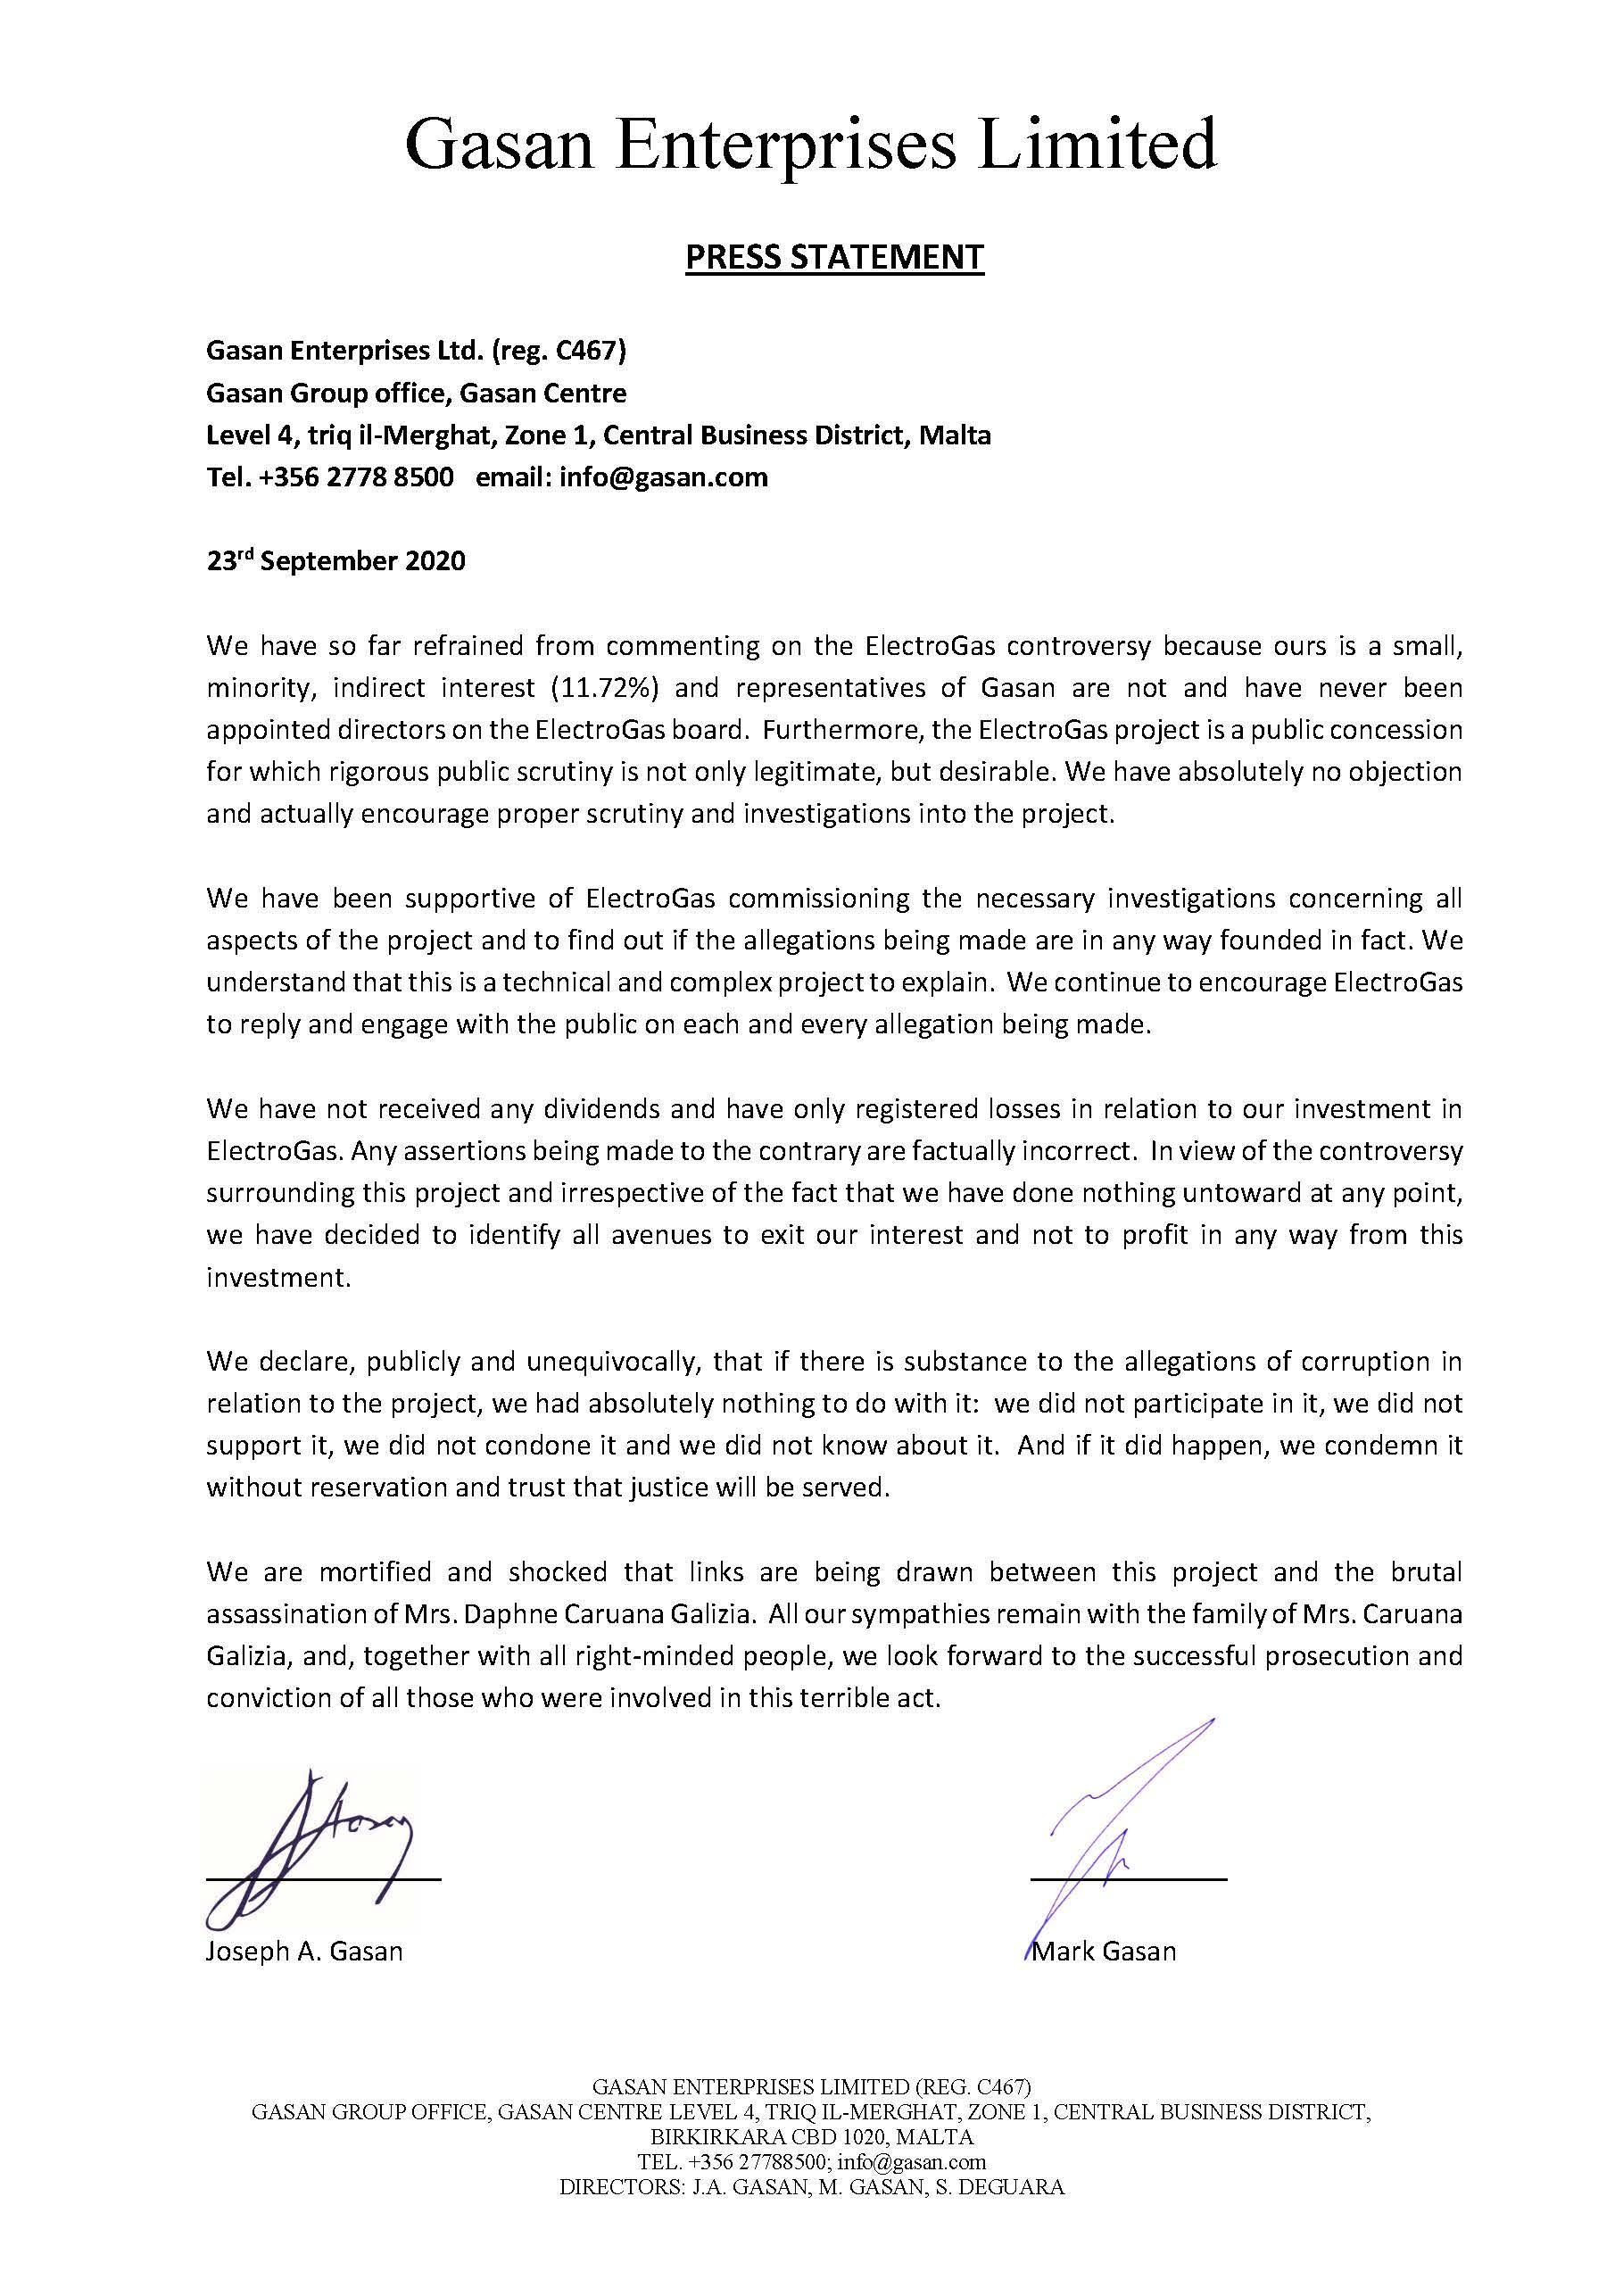 The Gasan Enterprises statement.